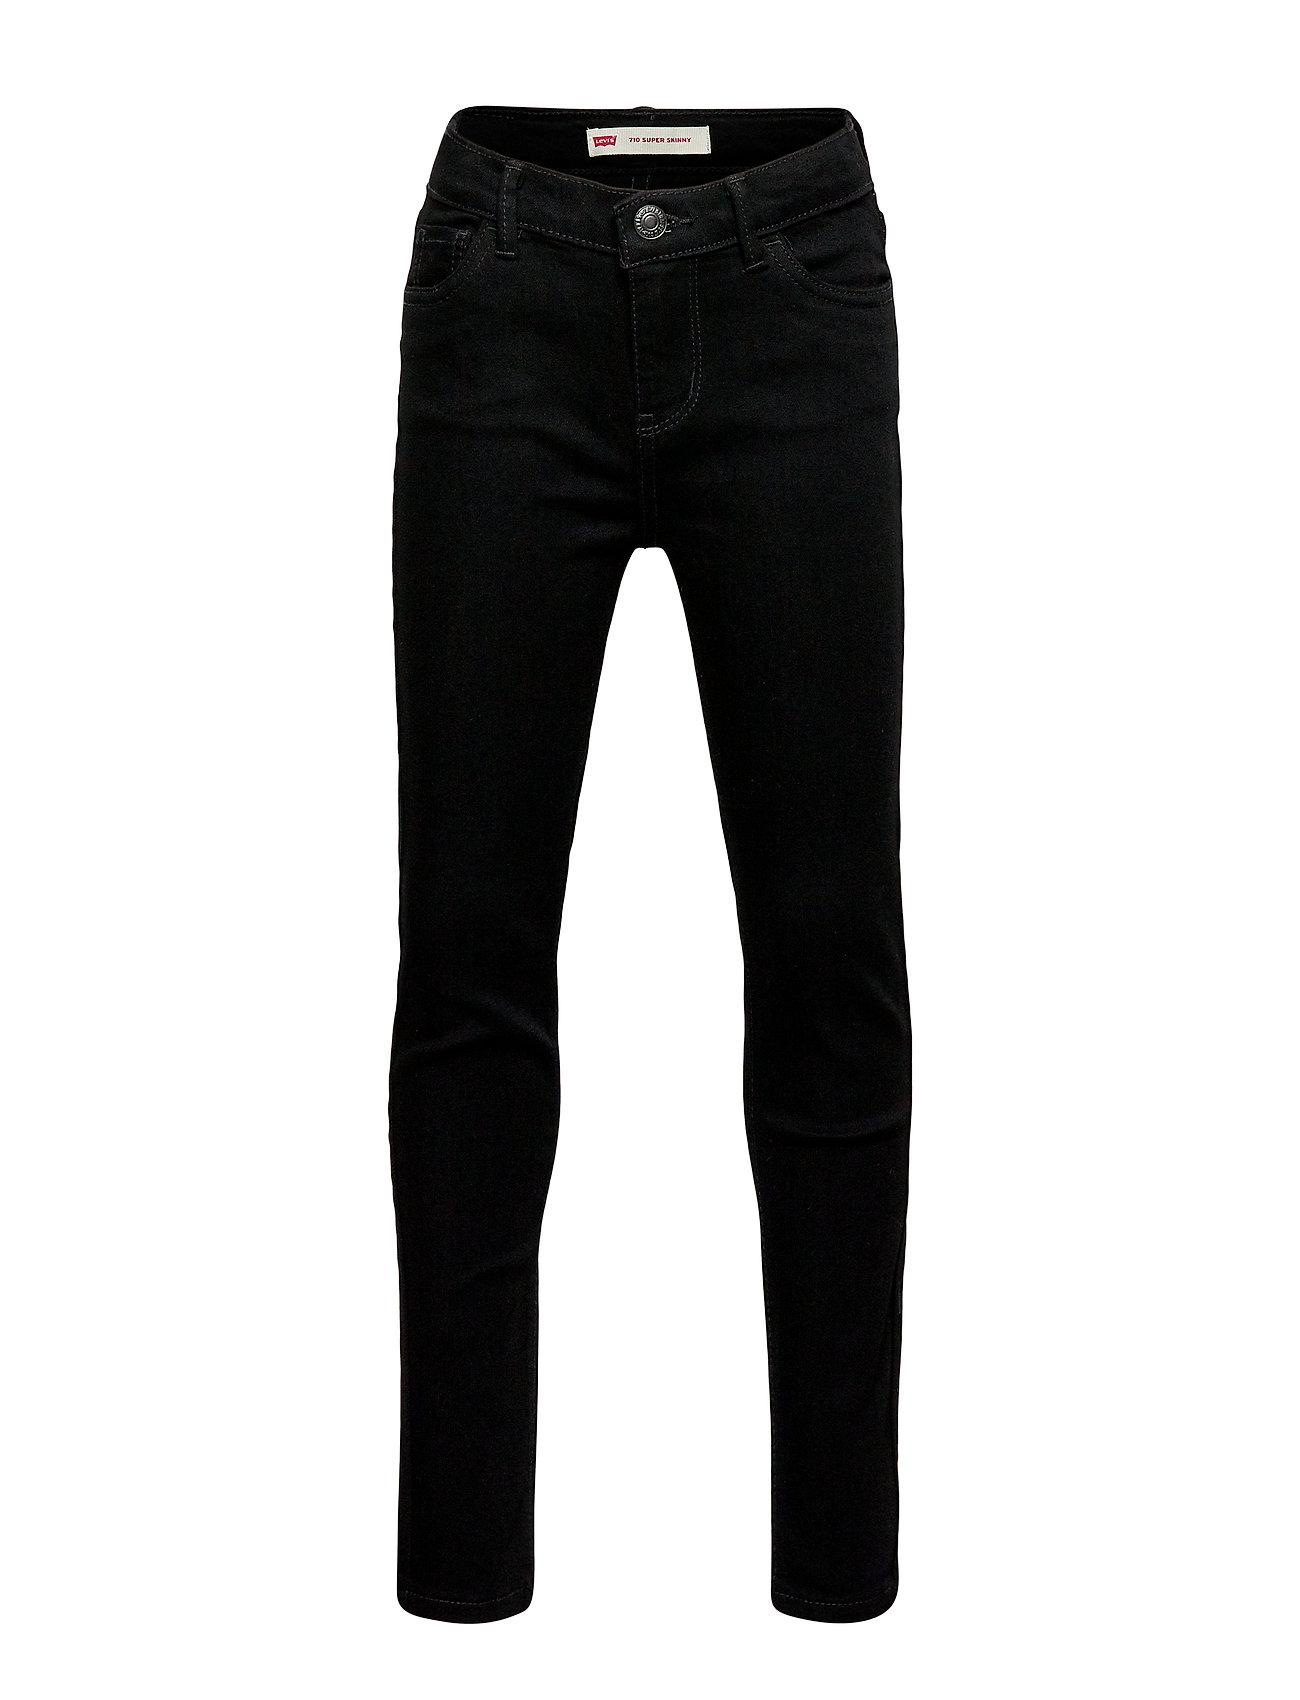 Levi's 710 Super Skinny - RINSED BLACK